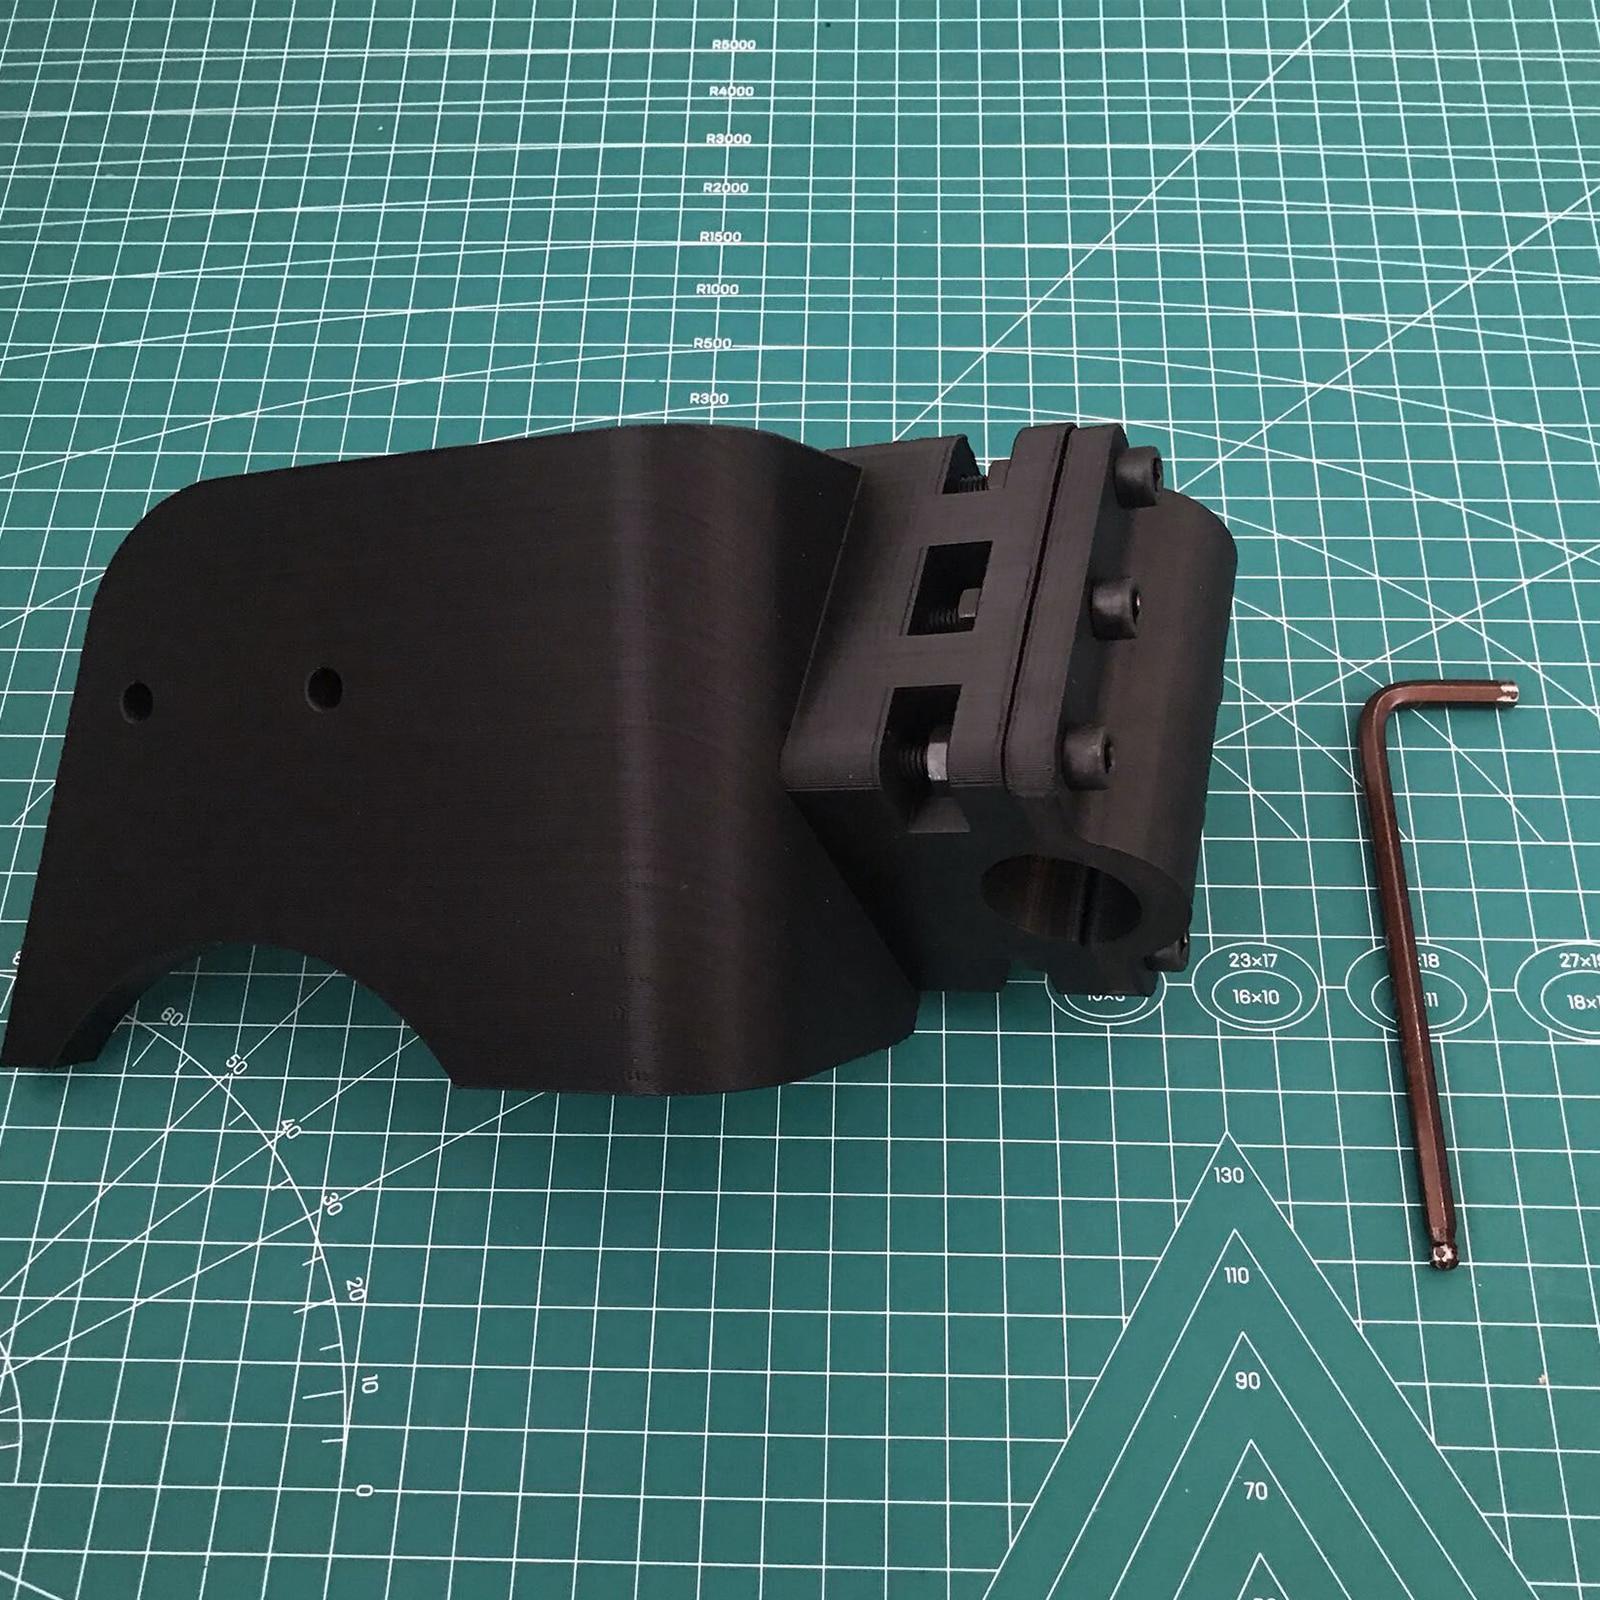 Soporte adaptador de perilla de cambio manual/Derecho de alta calidad para Thrustmaster TH8A Playseat, accesorios de modificación